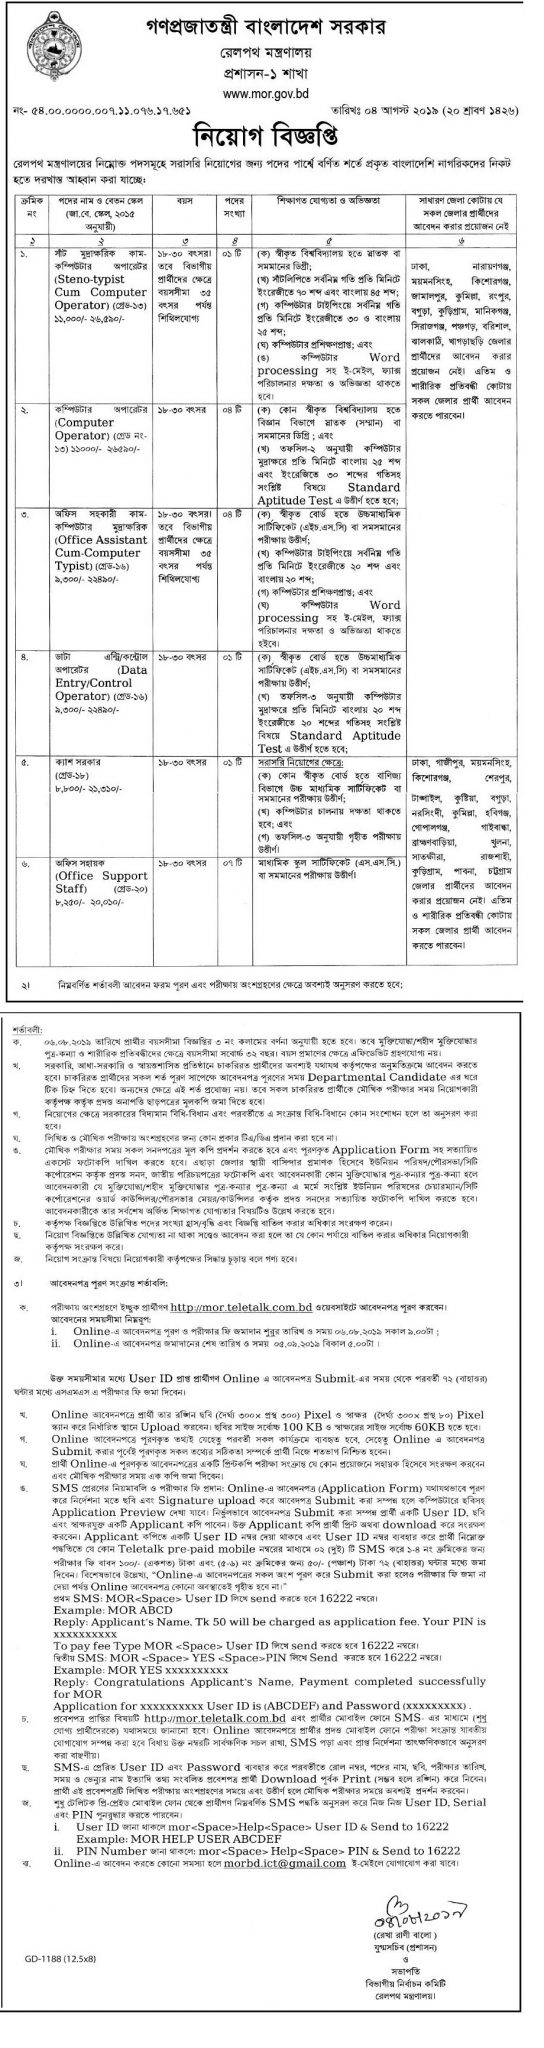 Bangladesh Railway Job Circular 2019| BD Jobs Careers